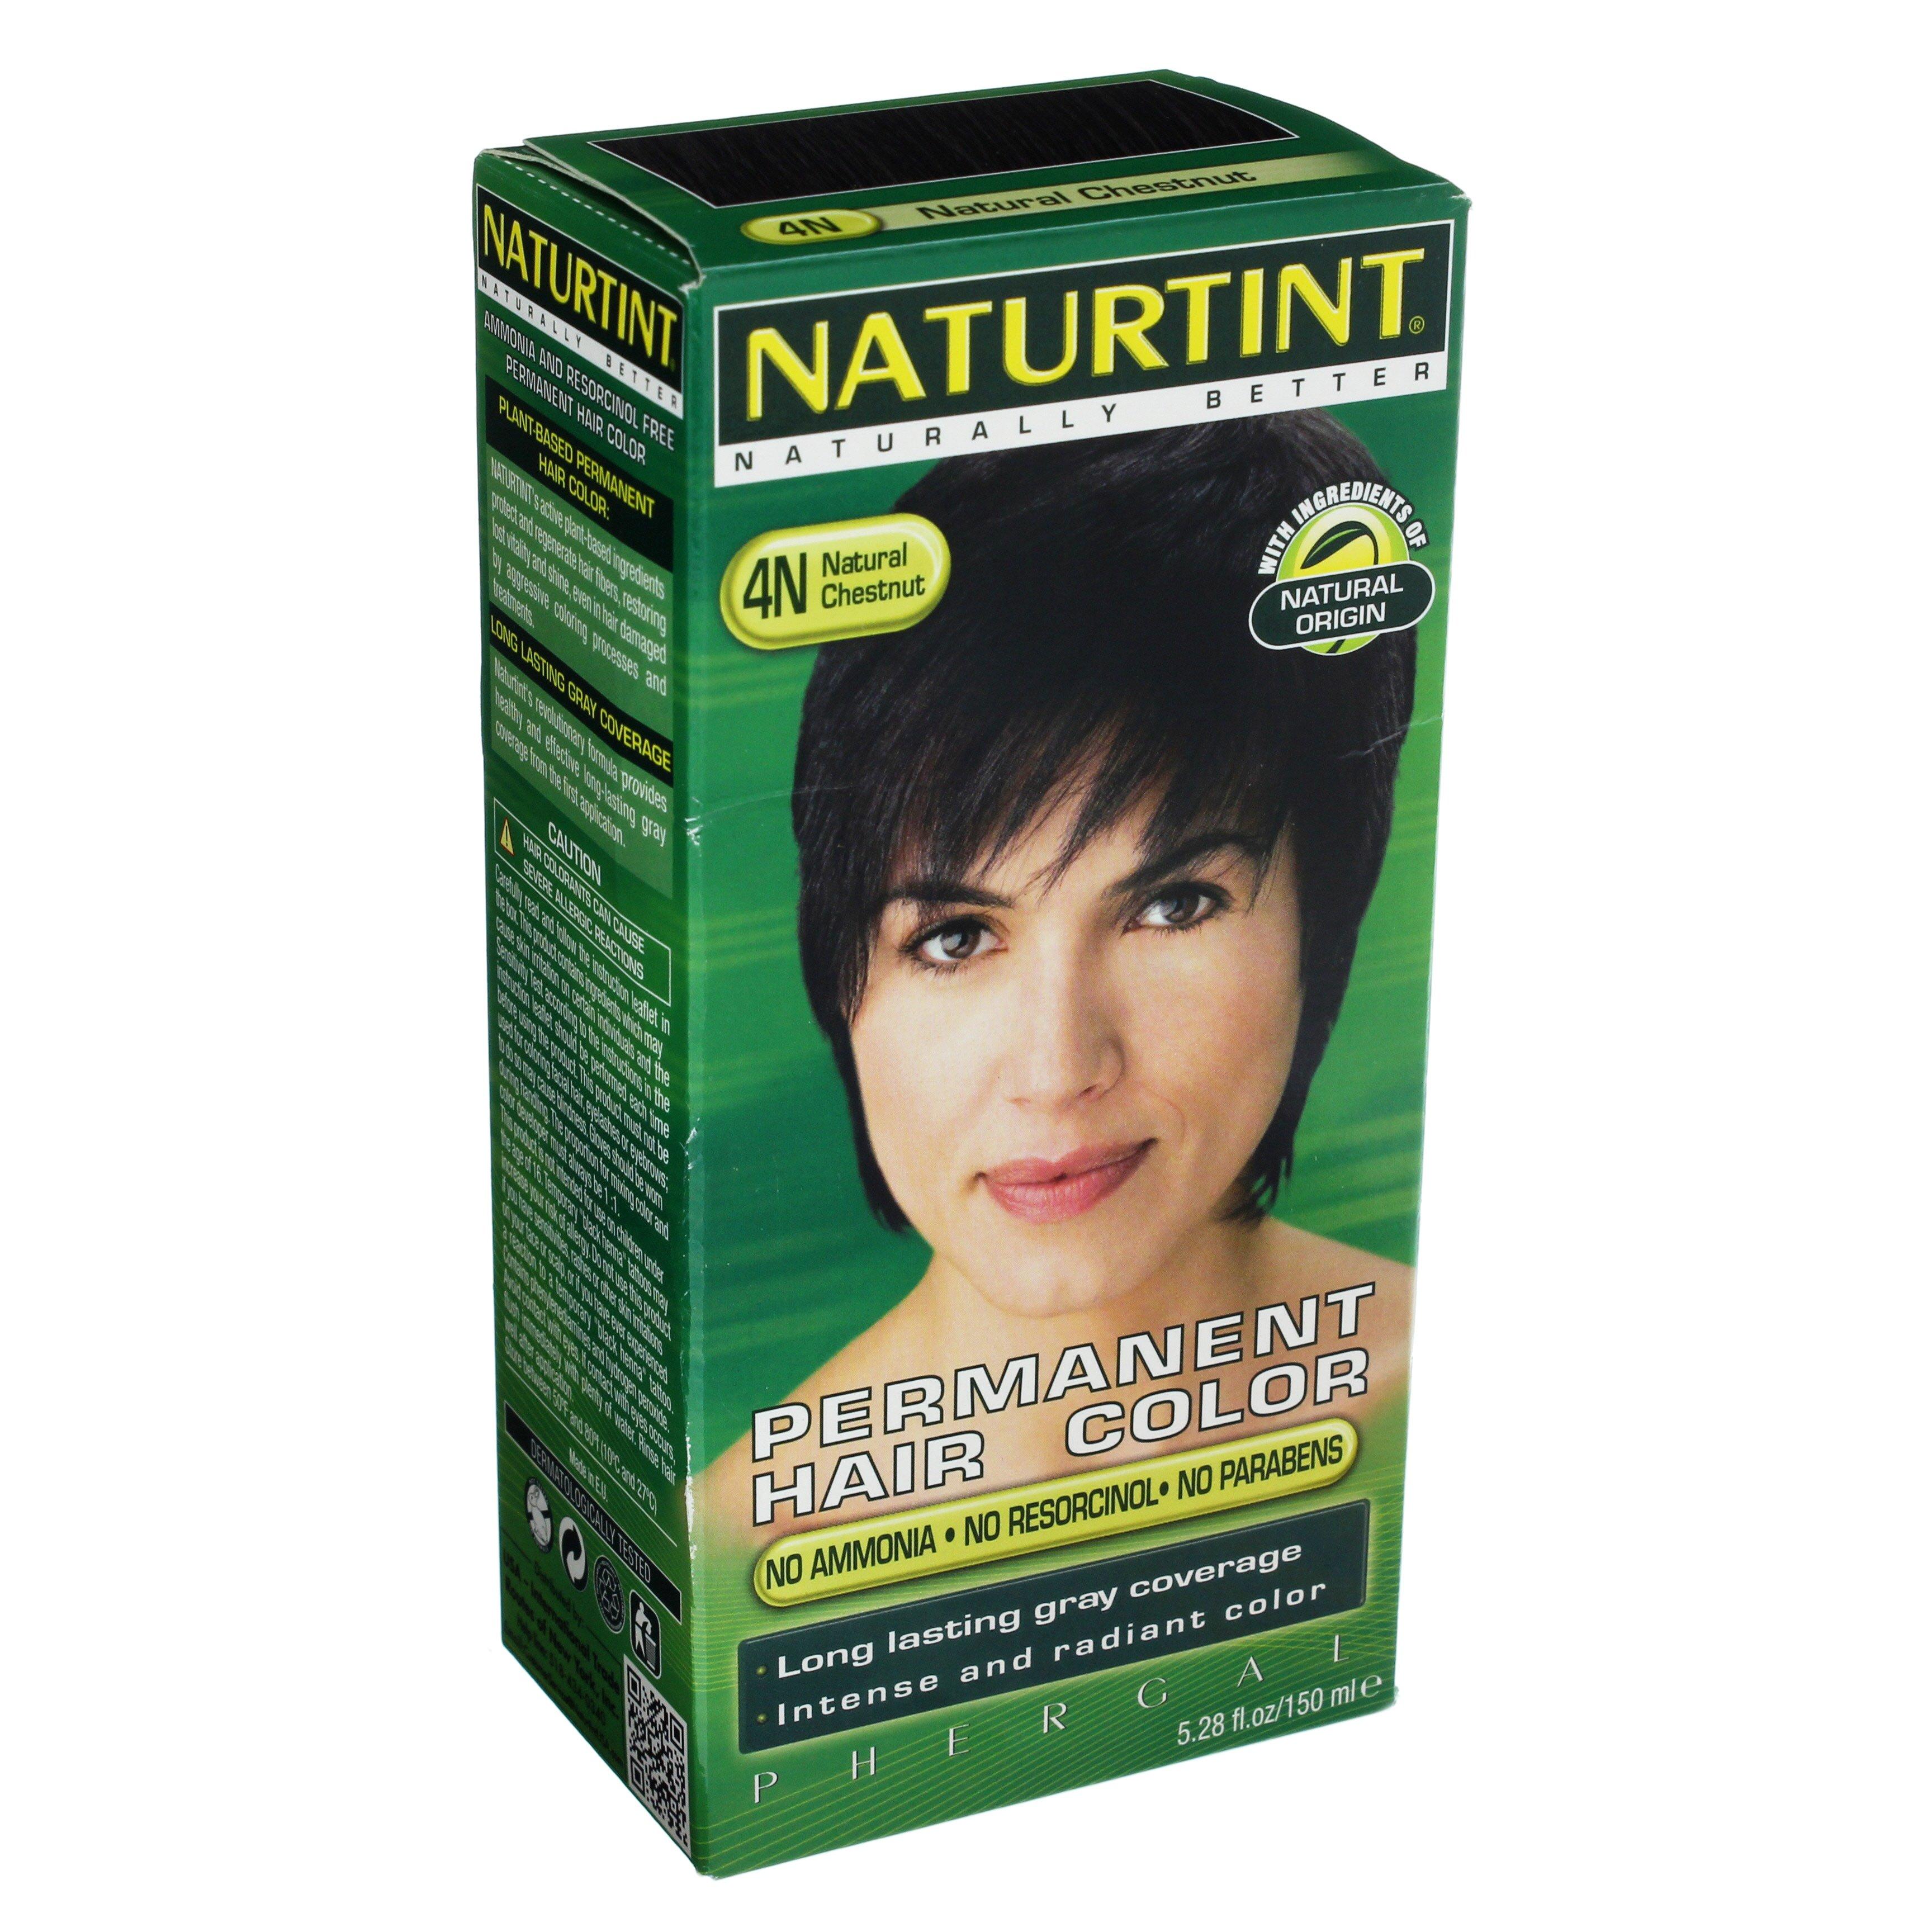 Naturtint Permanent Hair Color Natural Chestnut 4n Shop Hair